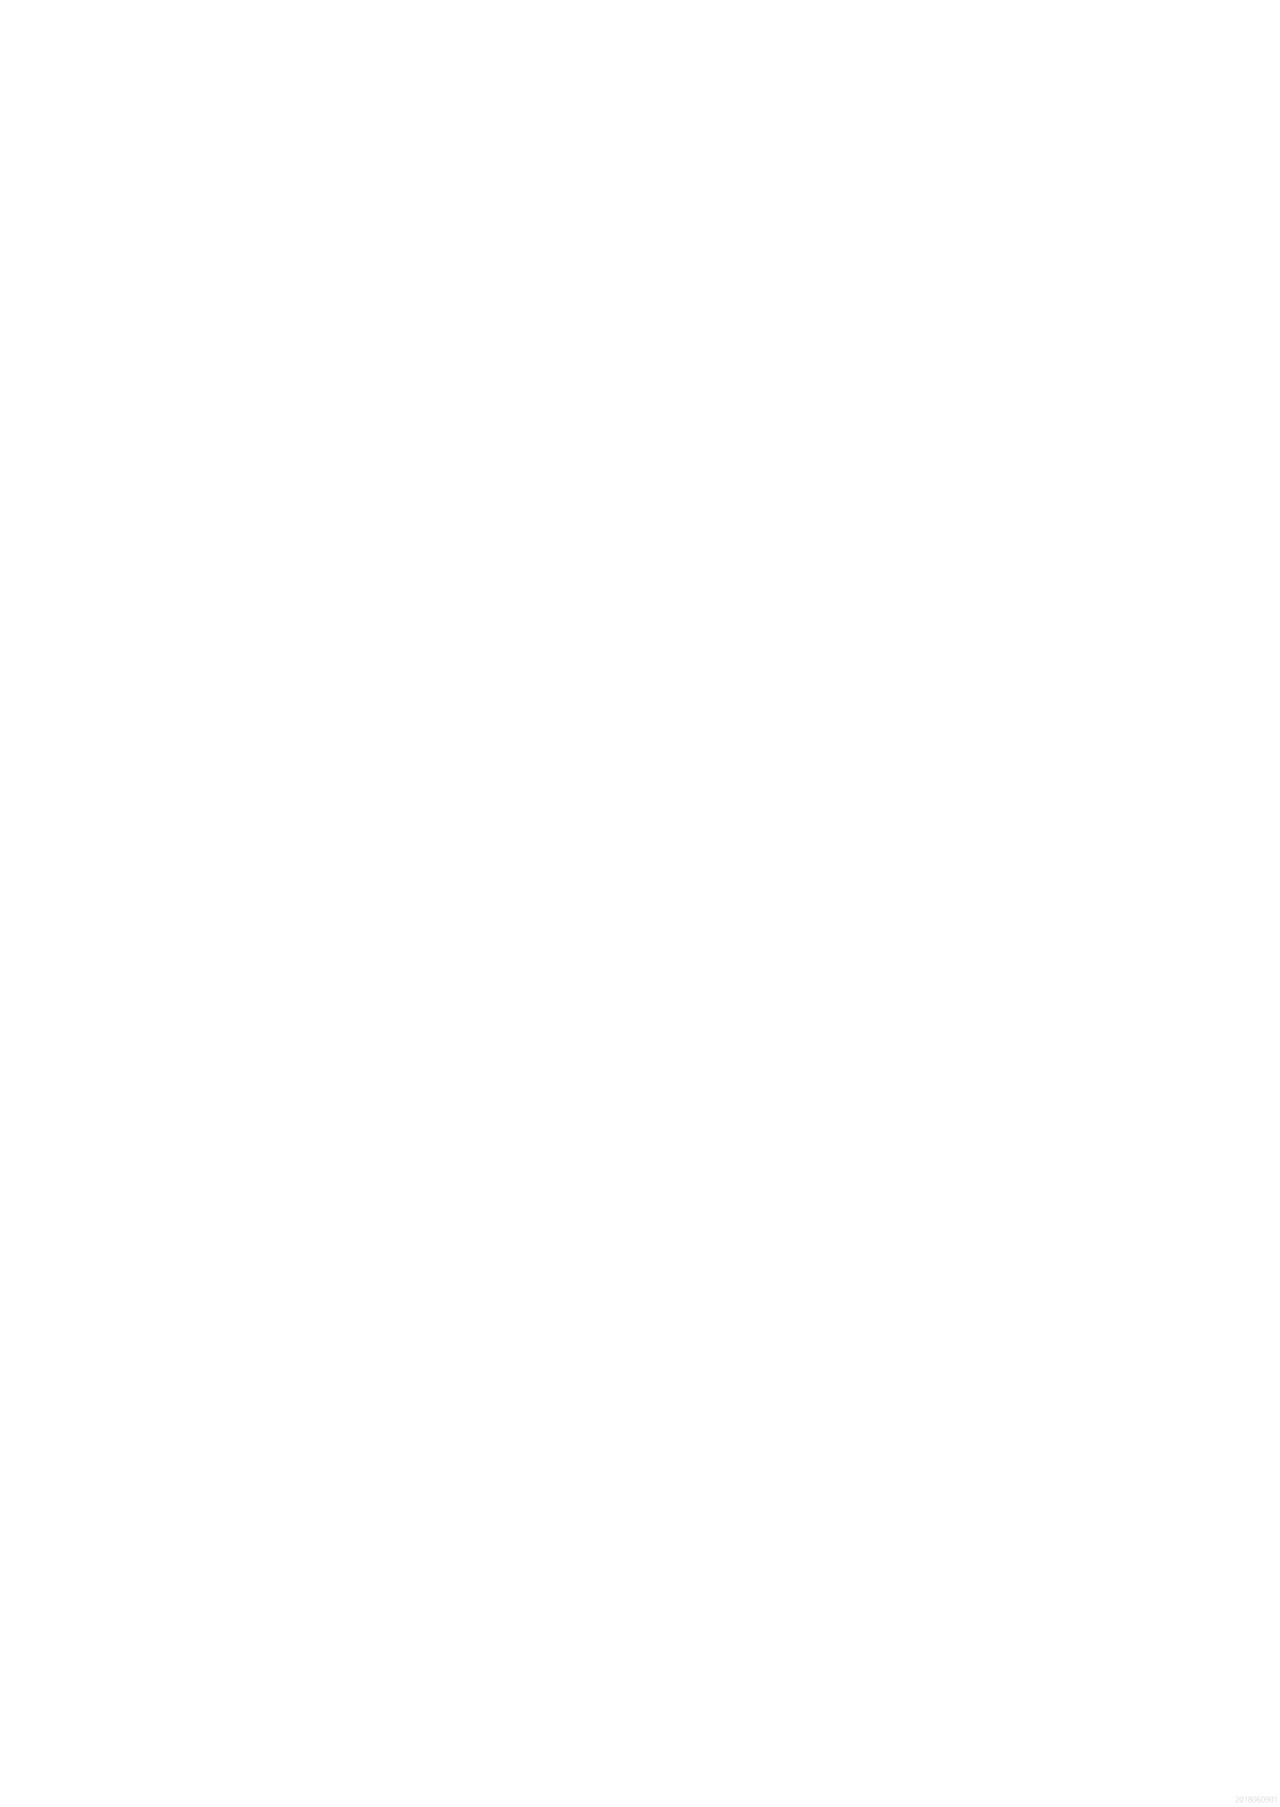 [Remora Works (isaki)] FUTACOLO CO -INHERITANCE- VOL. 003 [English] [Digital] {Hennojin} 1